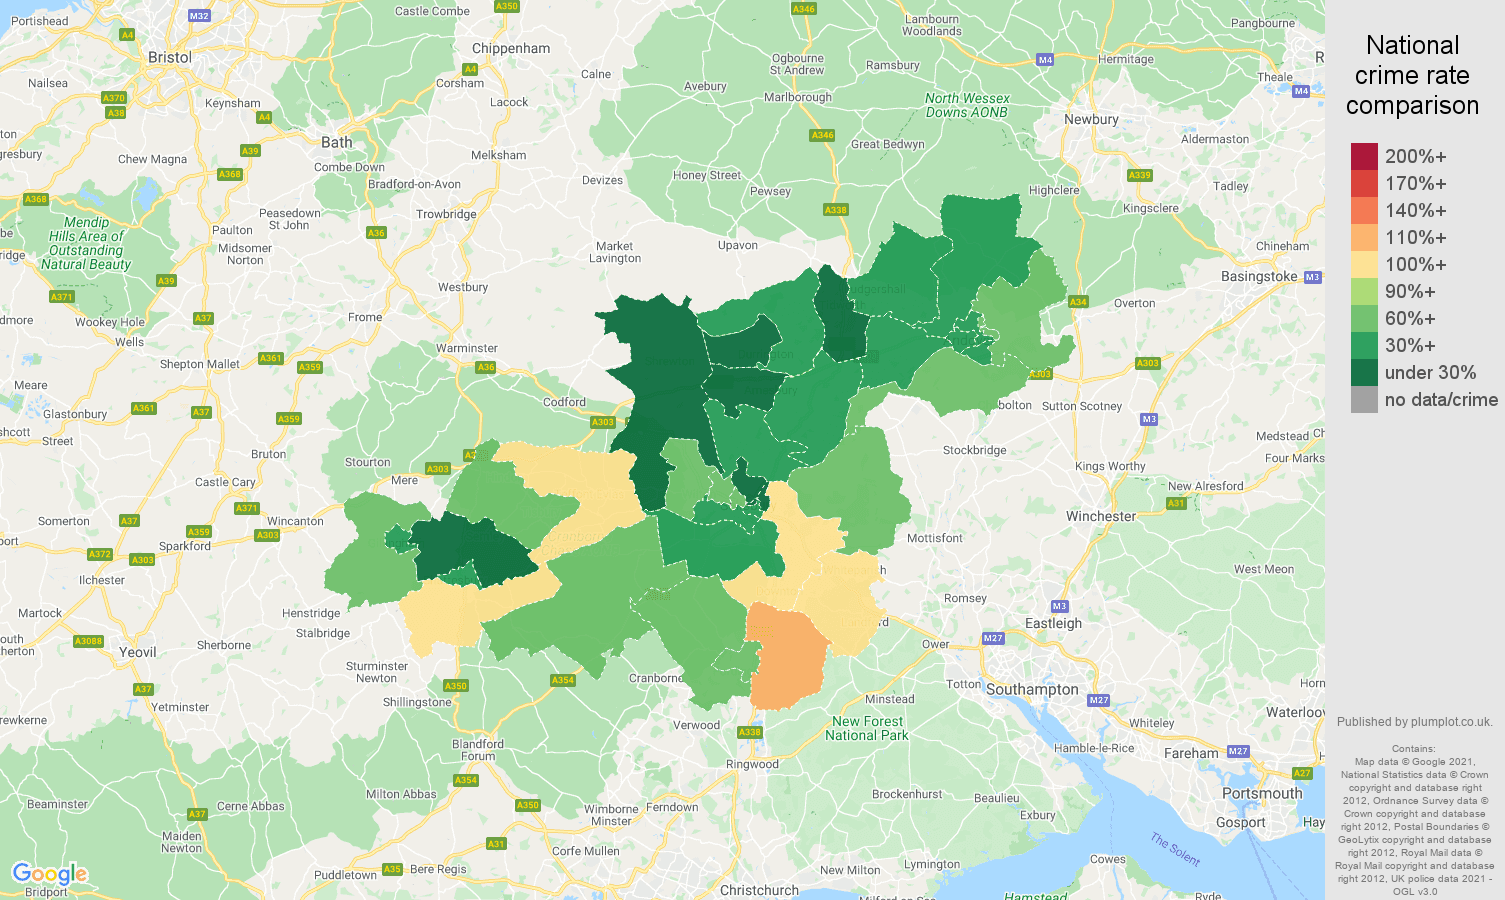 Salisbury vehicle crime rate comparison map